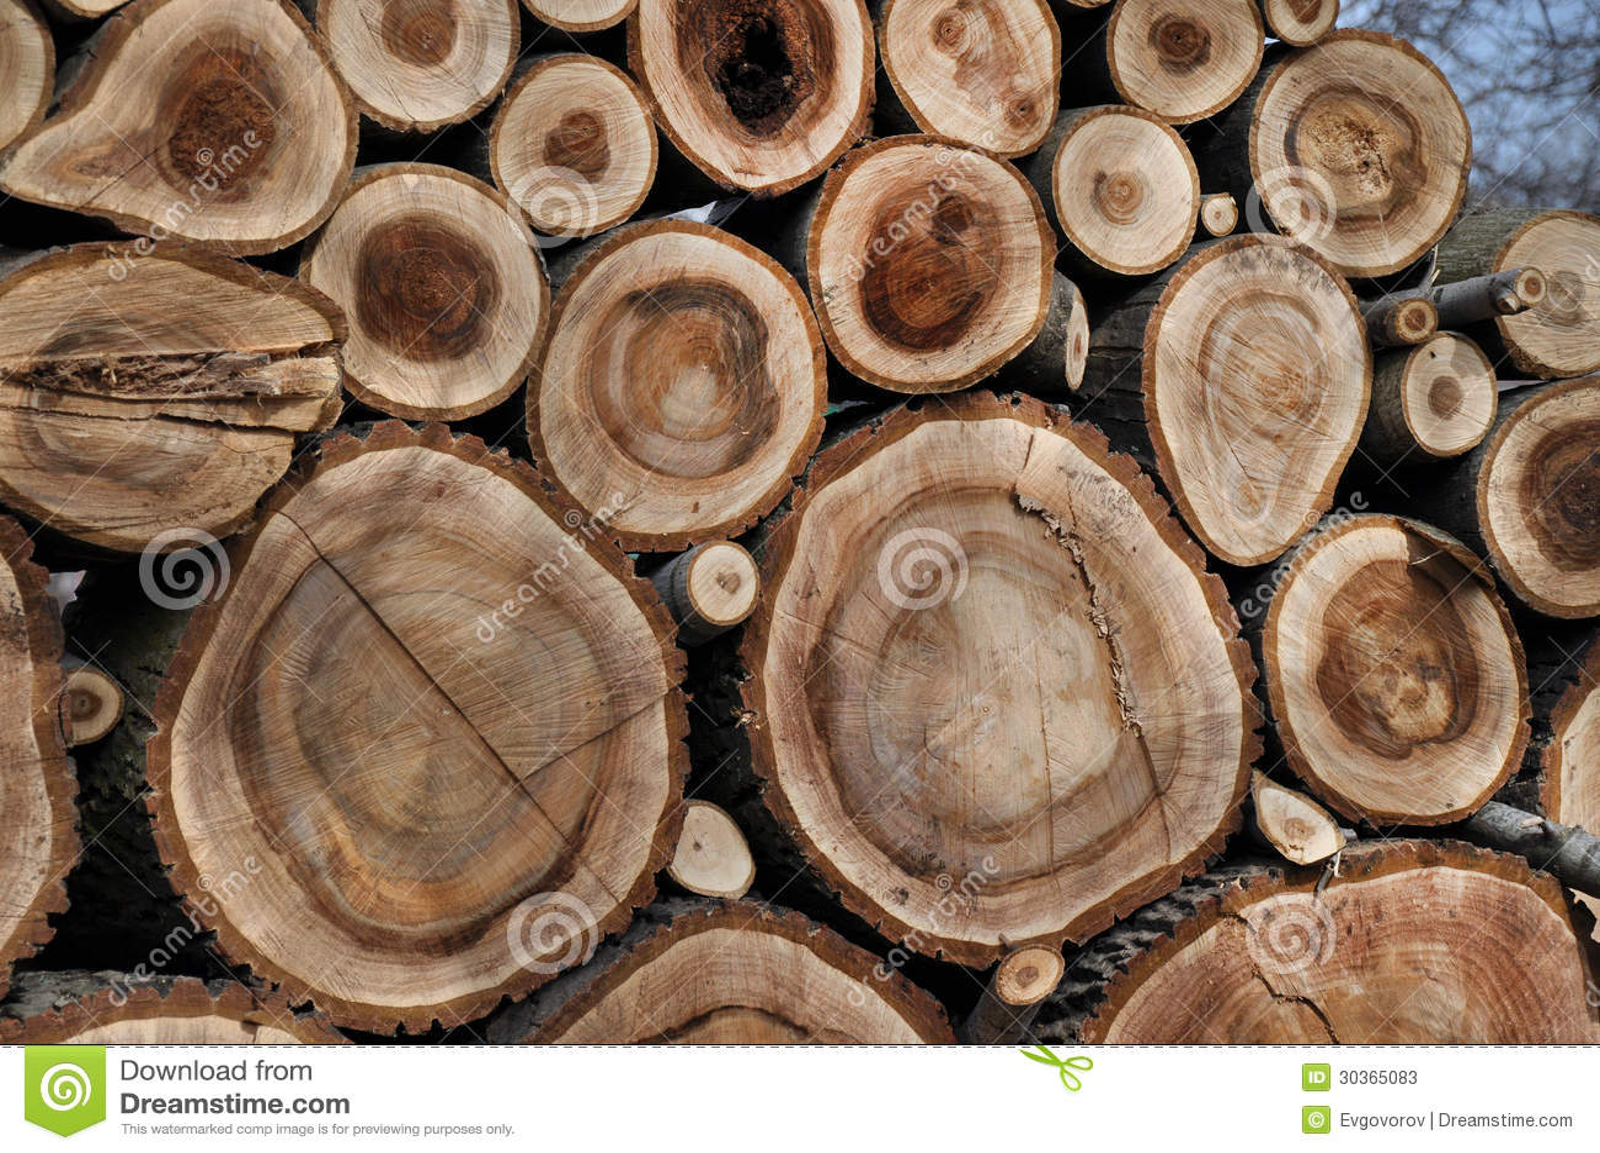 walnussholz stockbild bild von baum holz farbe kreis 30365083. Black Bedroom Furniture Sets. Home Design Ideas